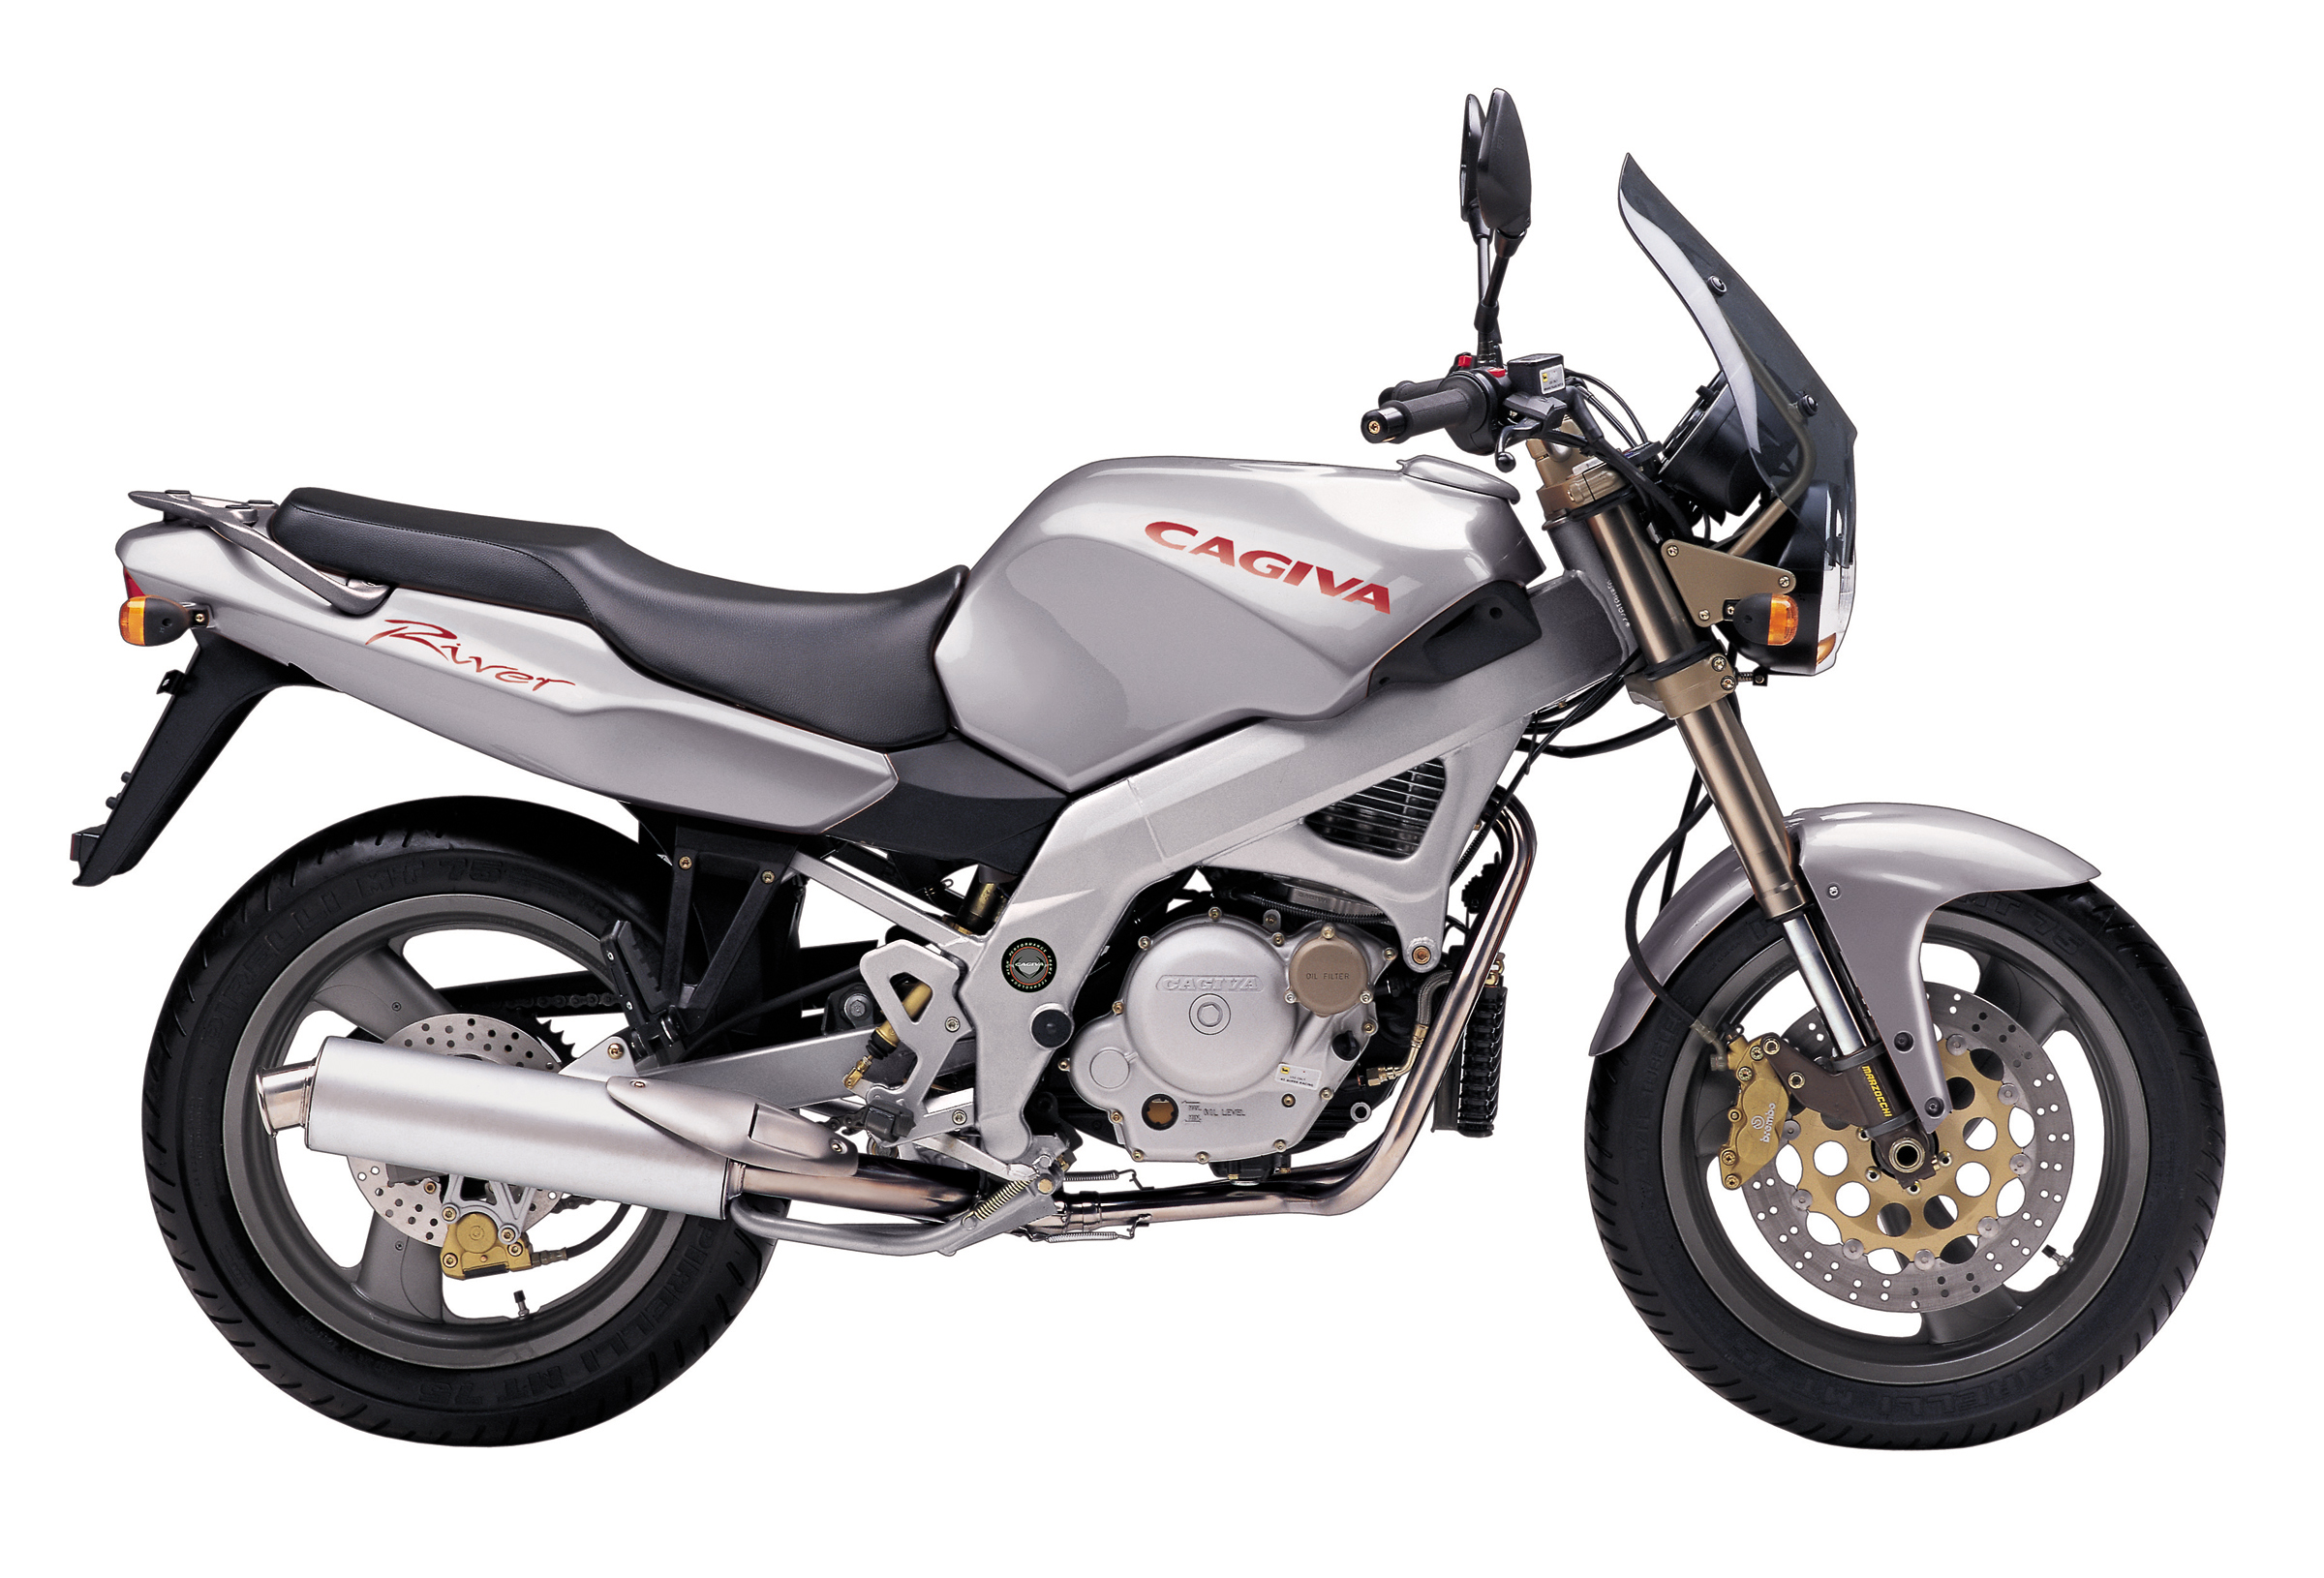 ampoules effet xenon pour moto toute CAGIVA River 500